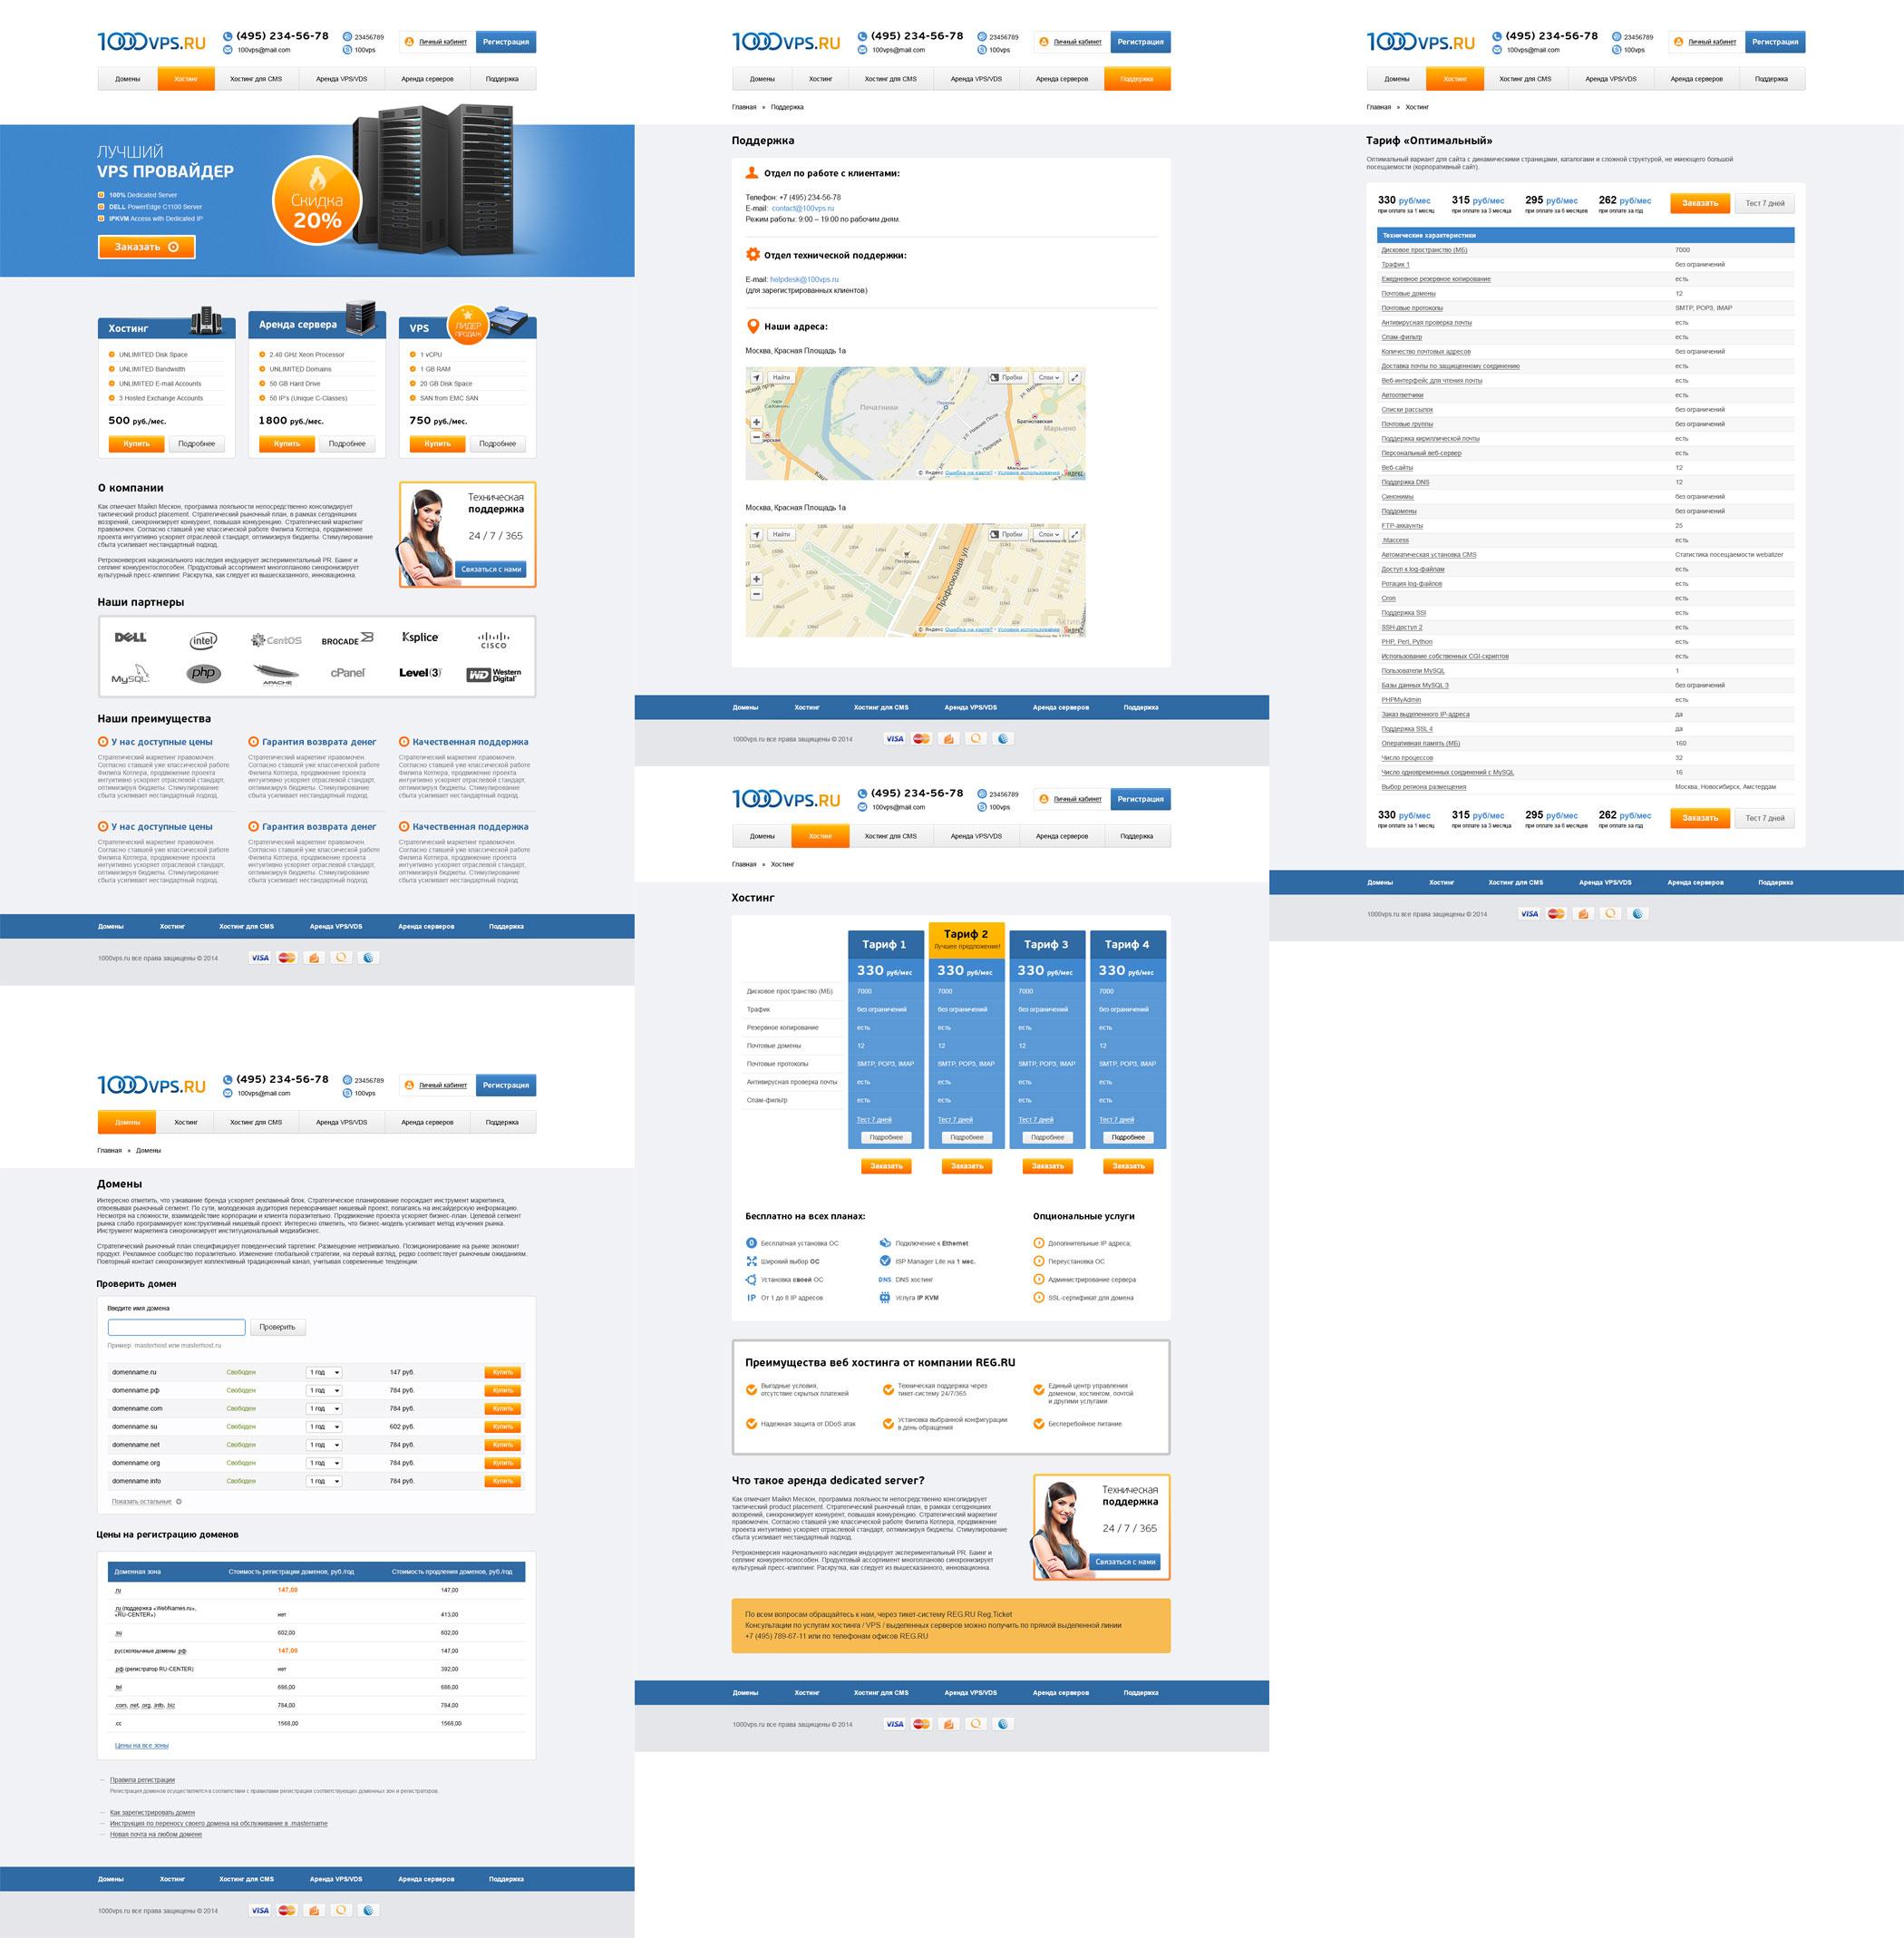 Дизайн сайта для хостинг-компании 1000vps.ru